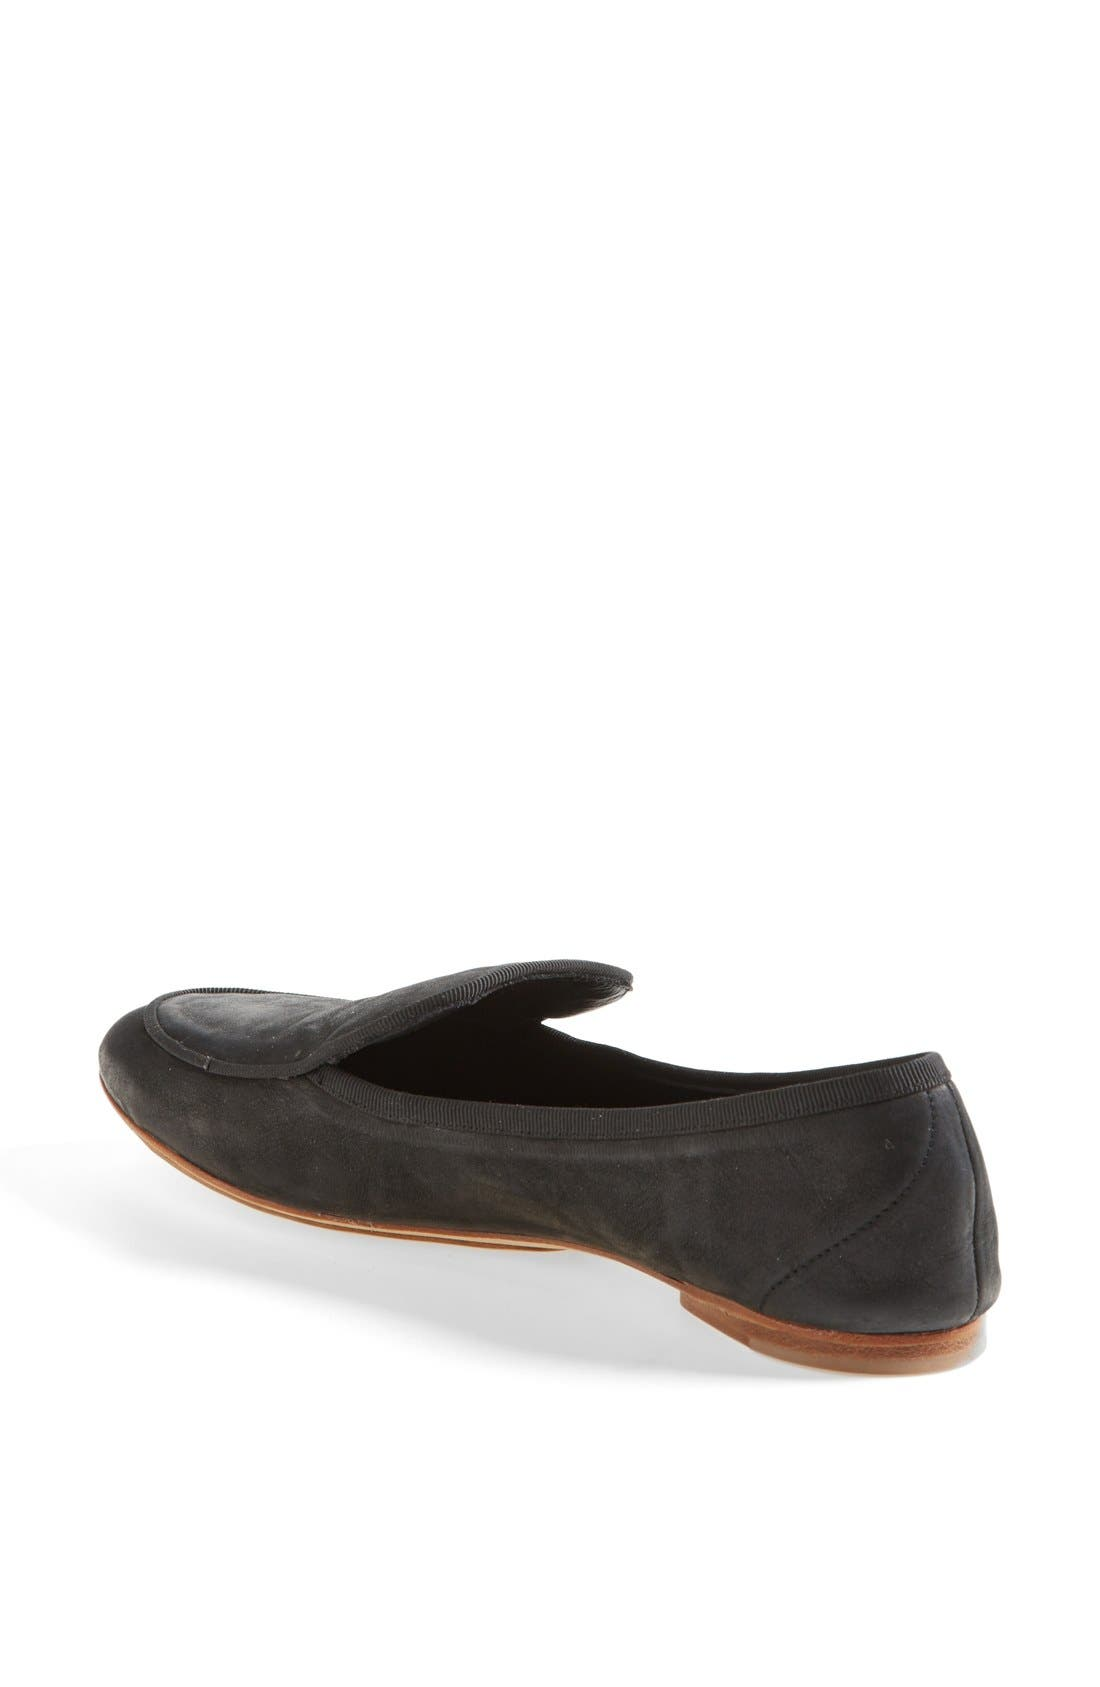 Alternate Image 2  - rag & bone 'Beeman' Loafer Flat